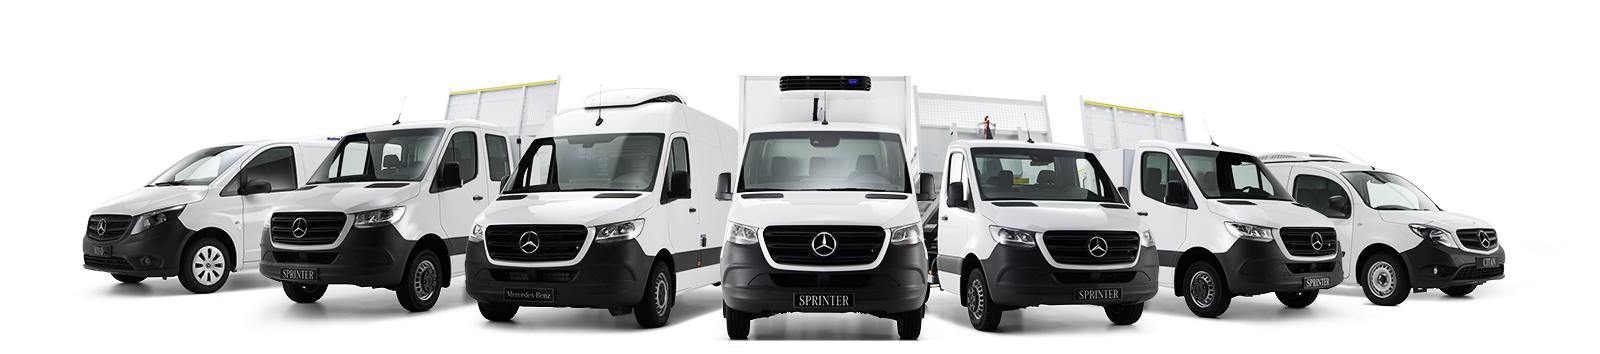 Frise-Mercedes-studio-grand-sud-specialiste-photo-vehicule